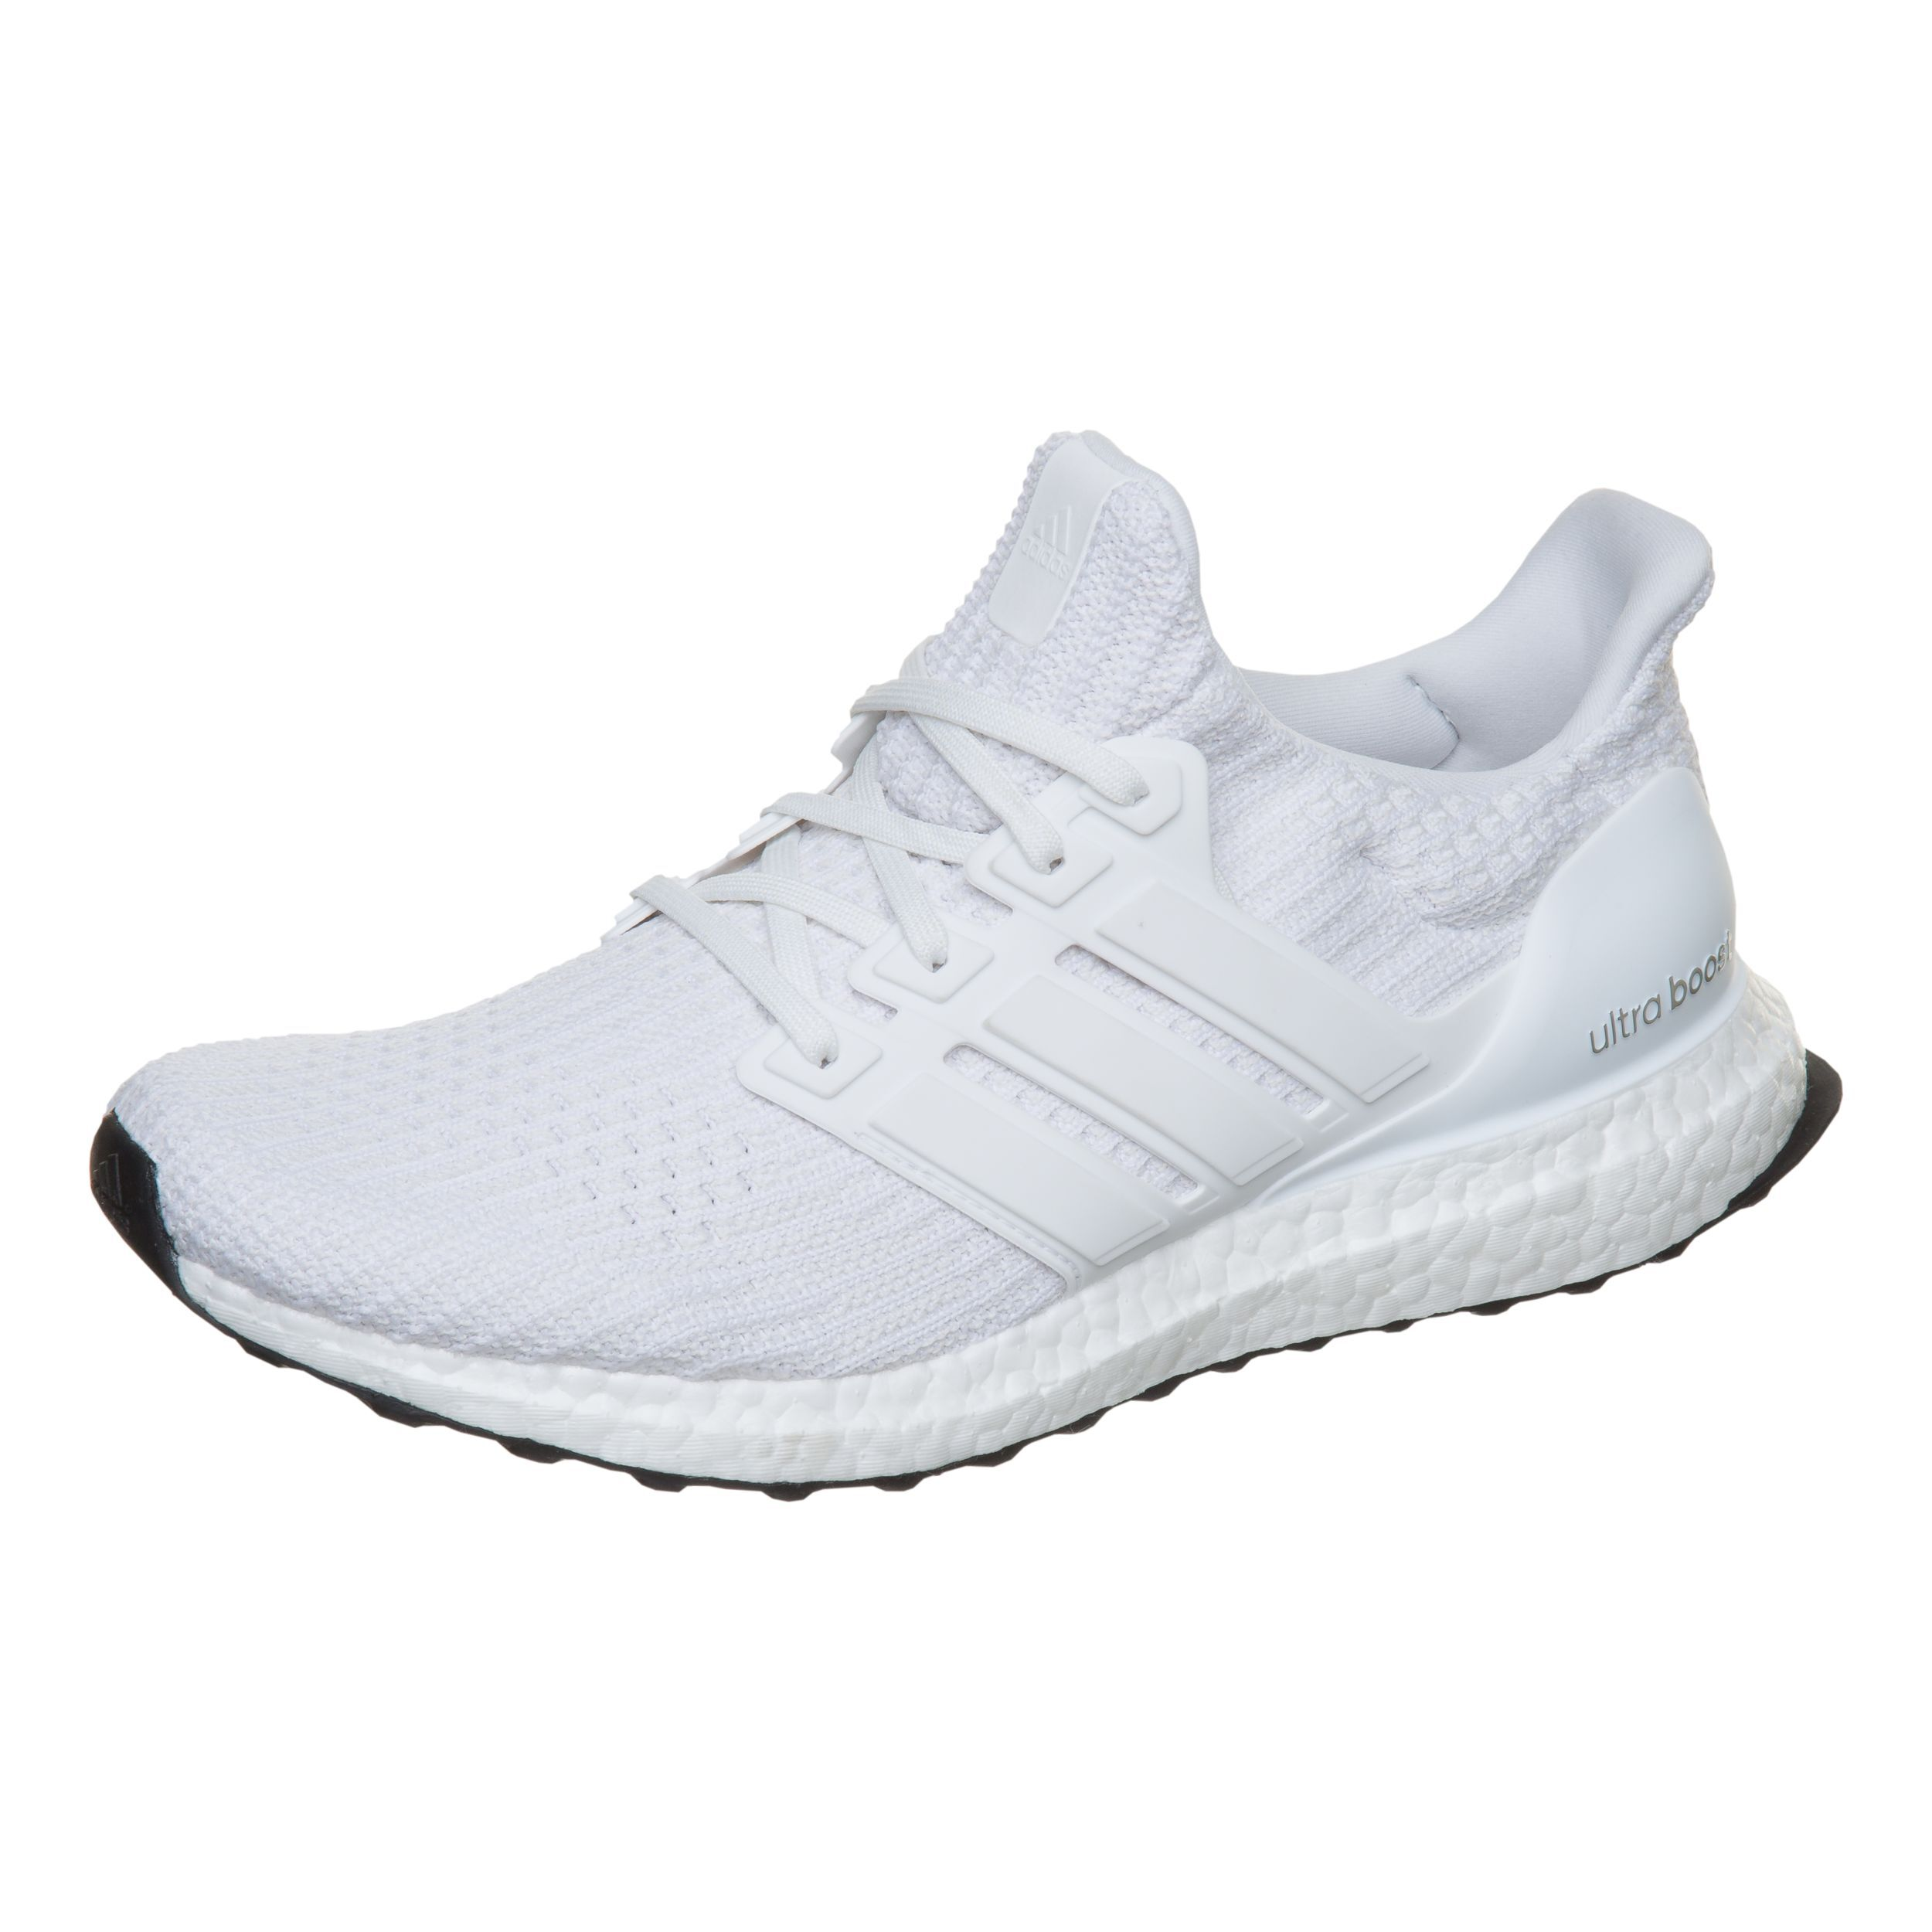 half off 37e34 09769 official store adidas ultra boost training schuhe weiß laufen 01519 1c657   closeout adidas adidas f561b a9902